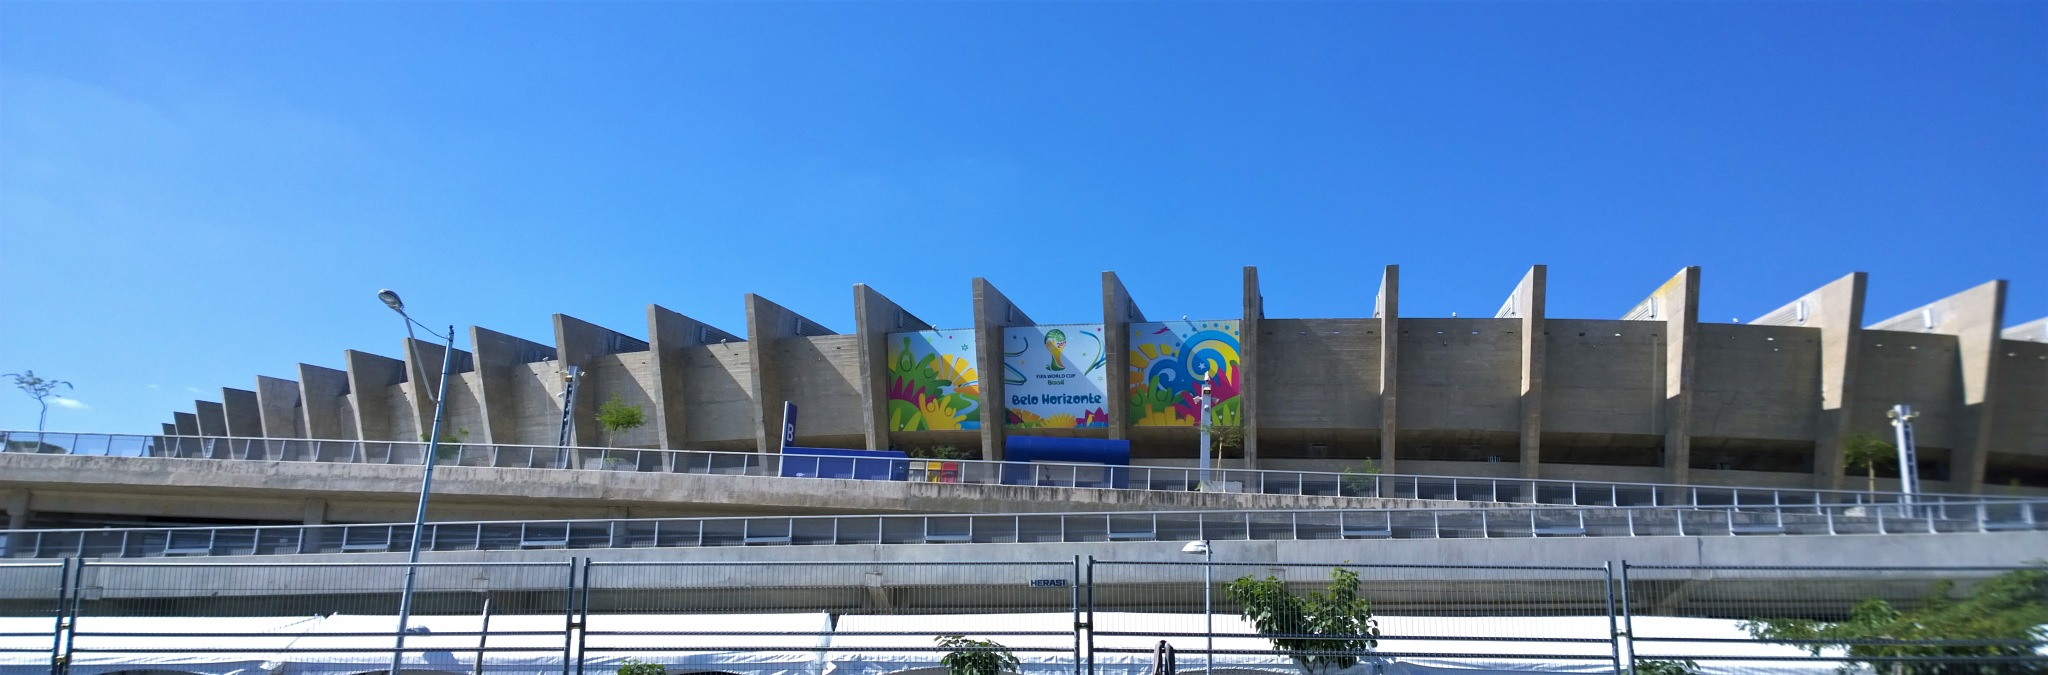 #mineirao  Estádio Gov. Magalães Pinto by mário lellis